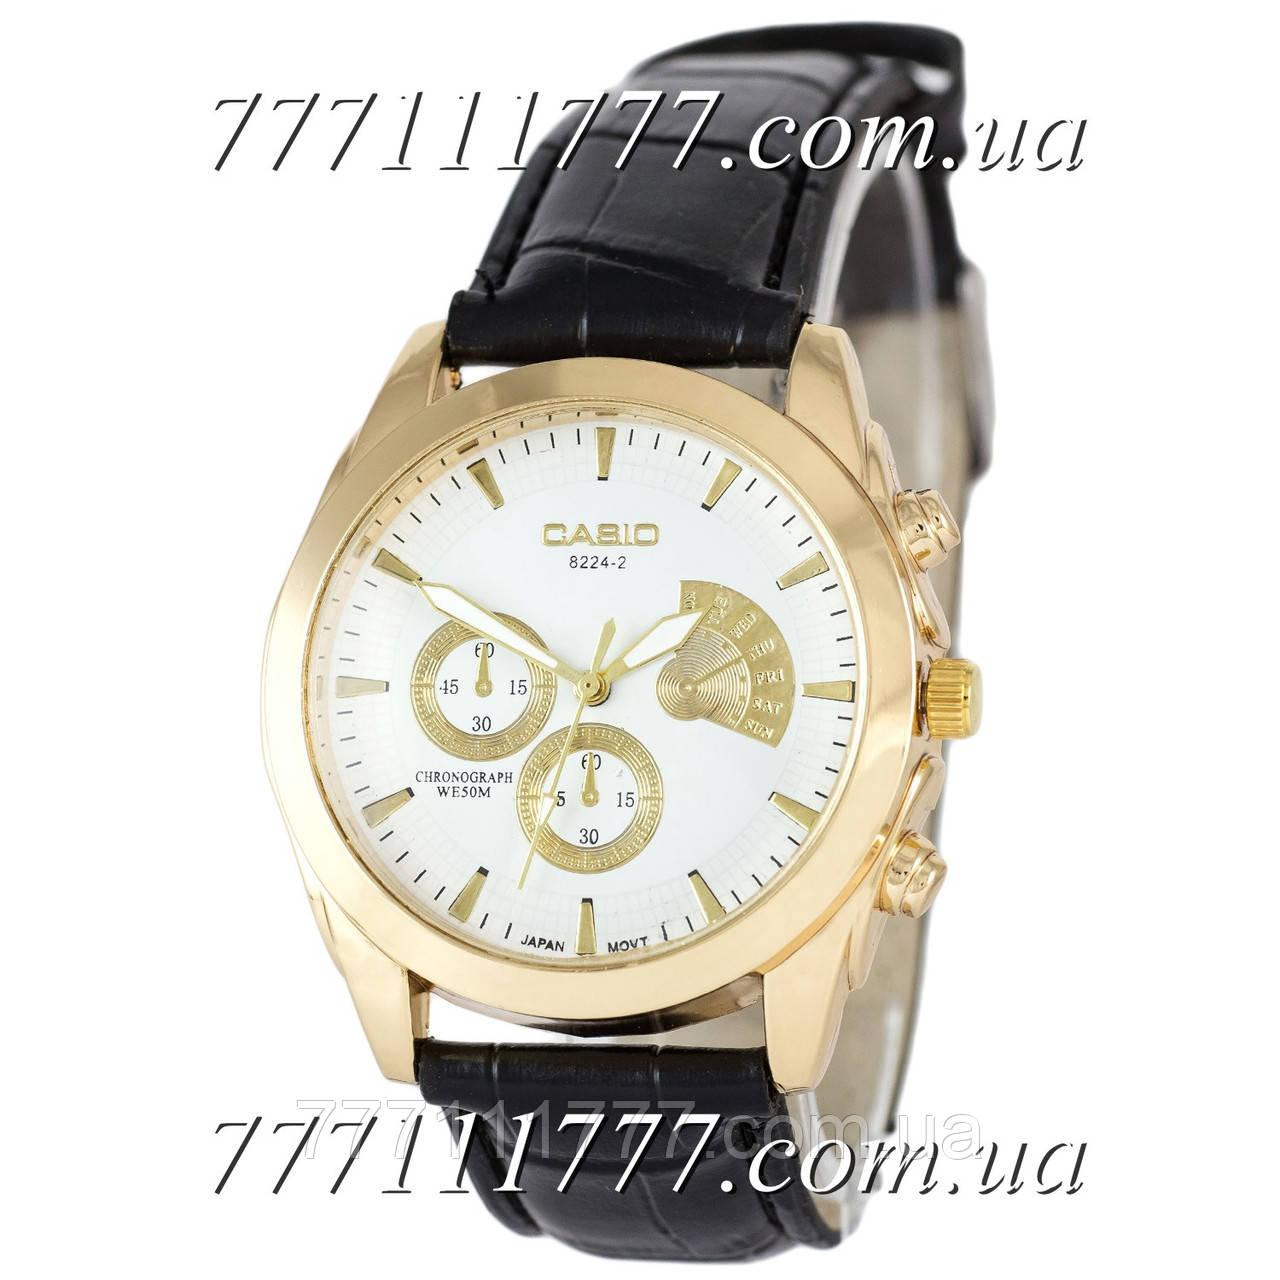 12df898815b3 Часы мужские наручные Casio 8224-2 Black-Gold-White  продажа, цена в ...